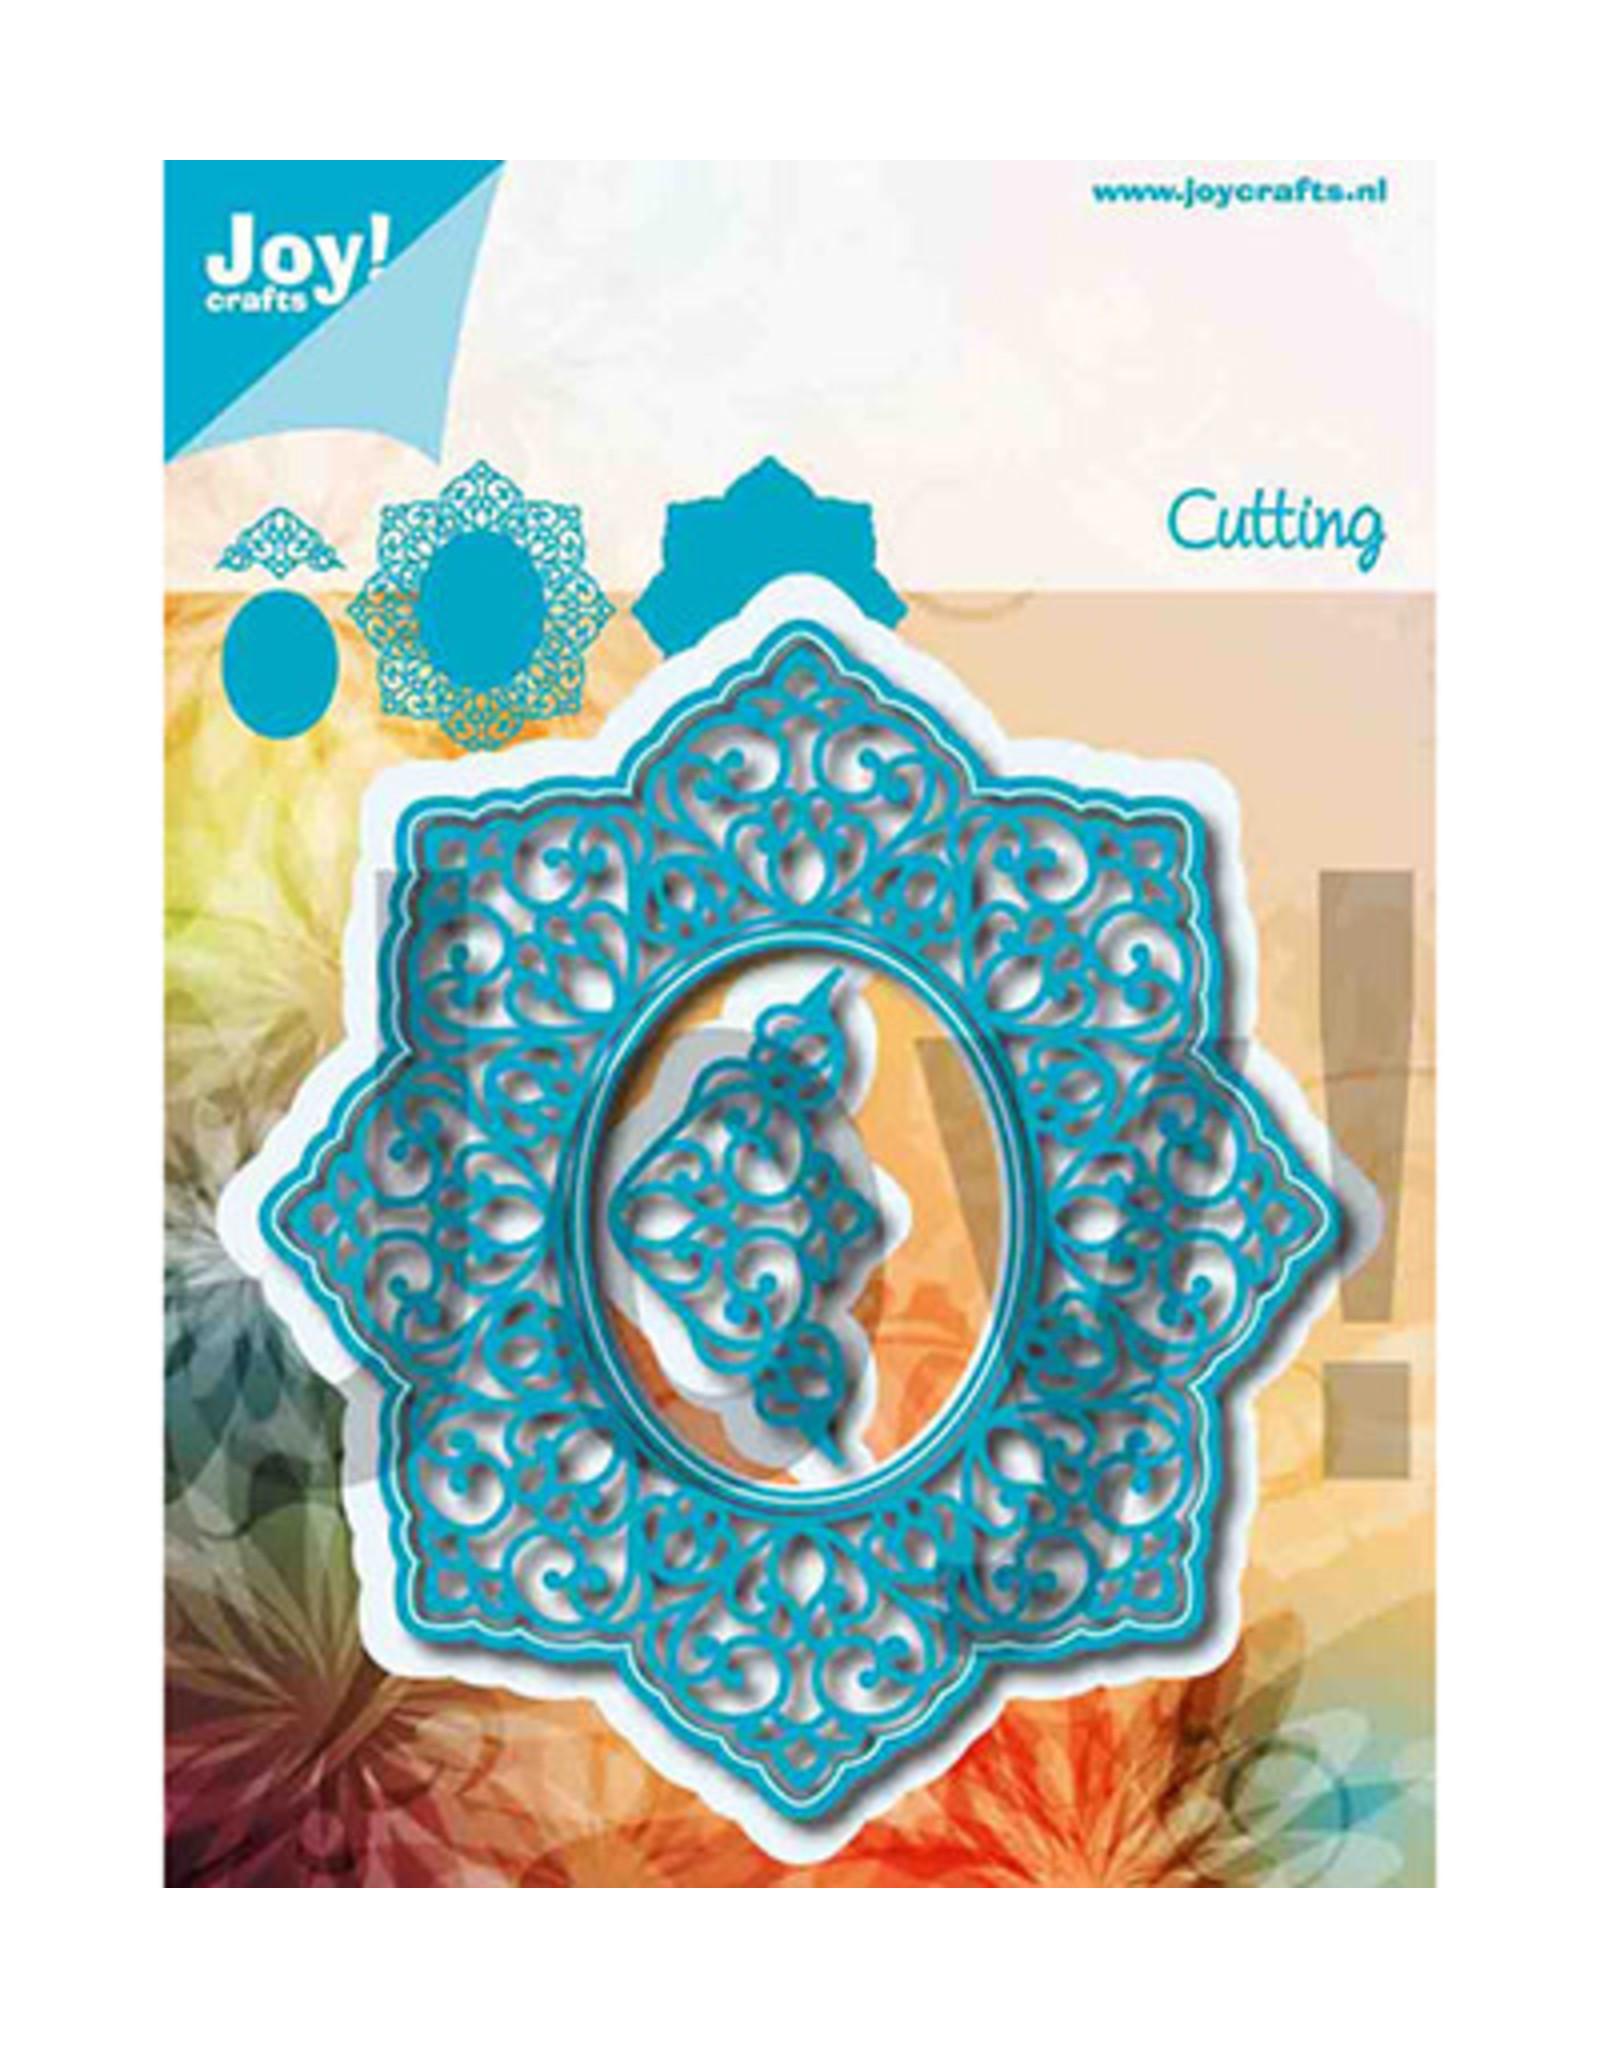 Joy Craft Joy Crafts Ornamenten Noor - Lovely Oval 6002/1256